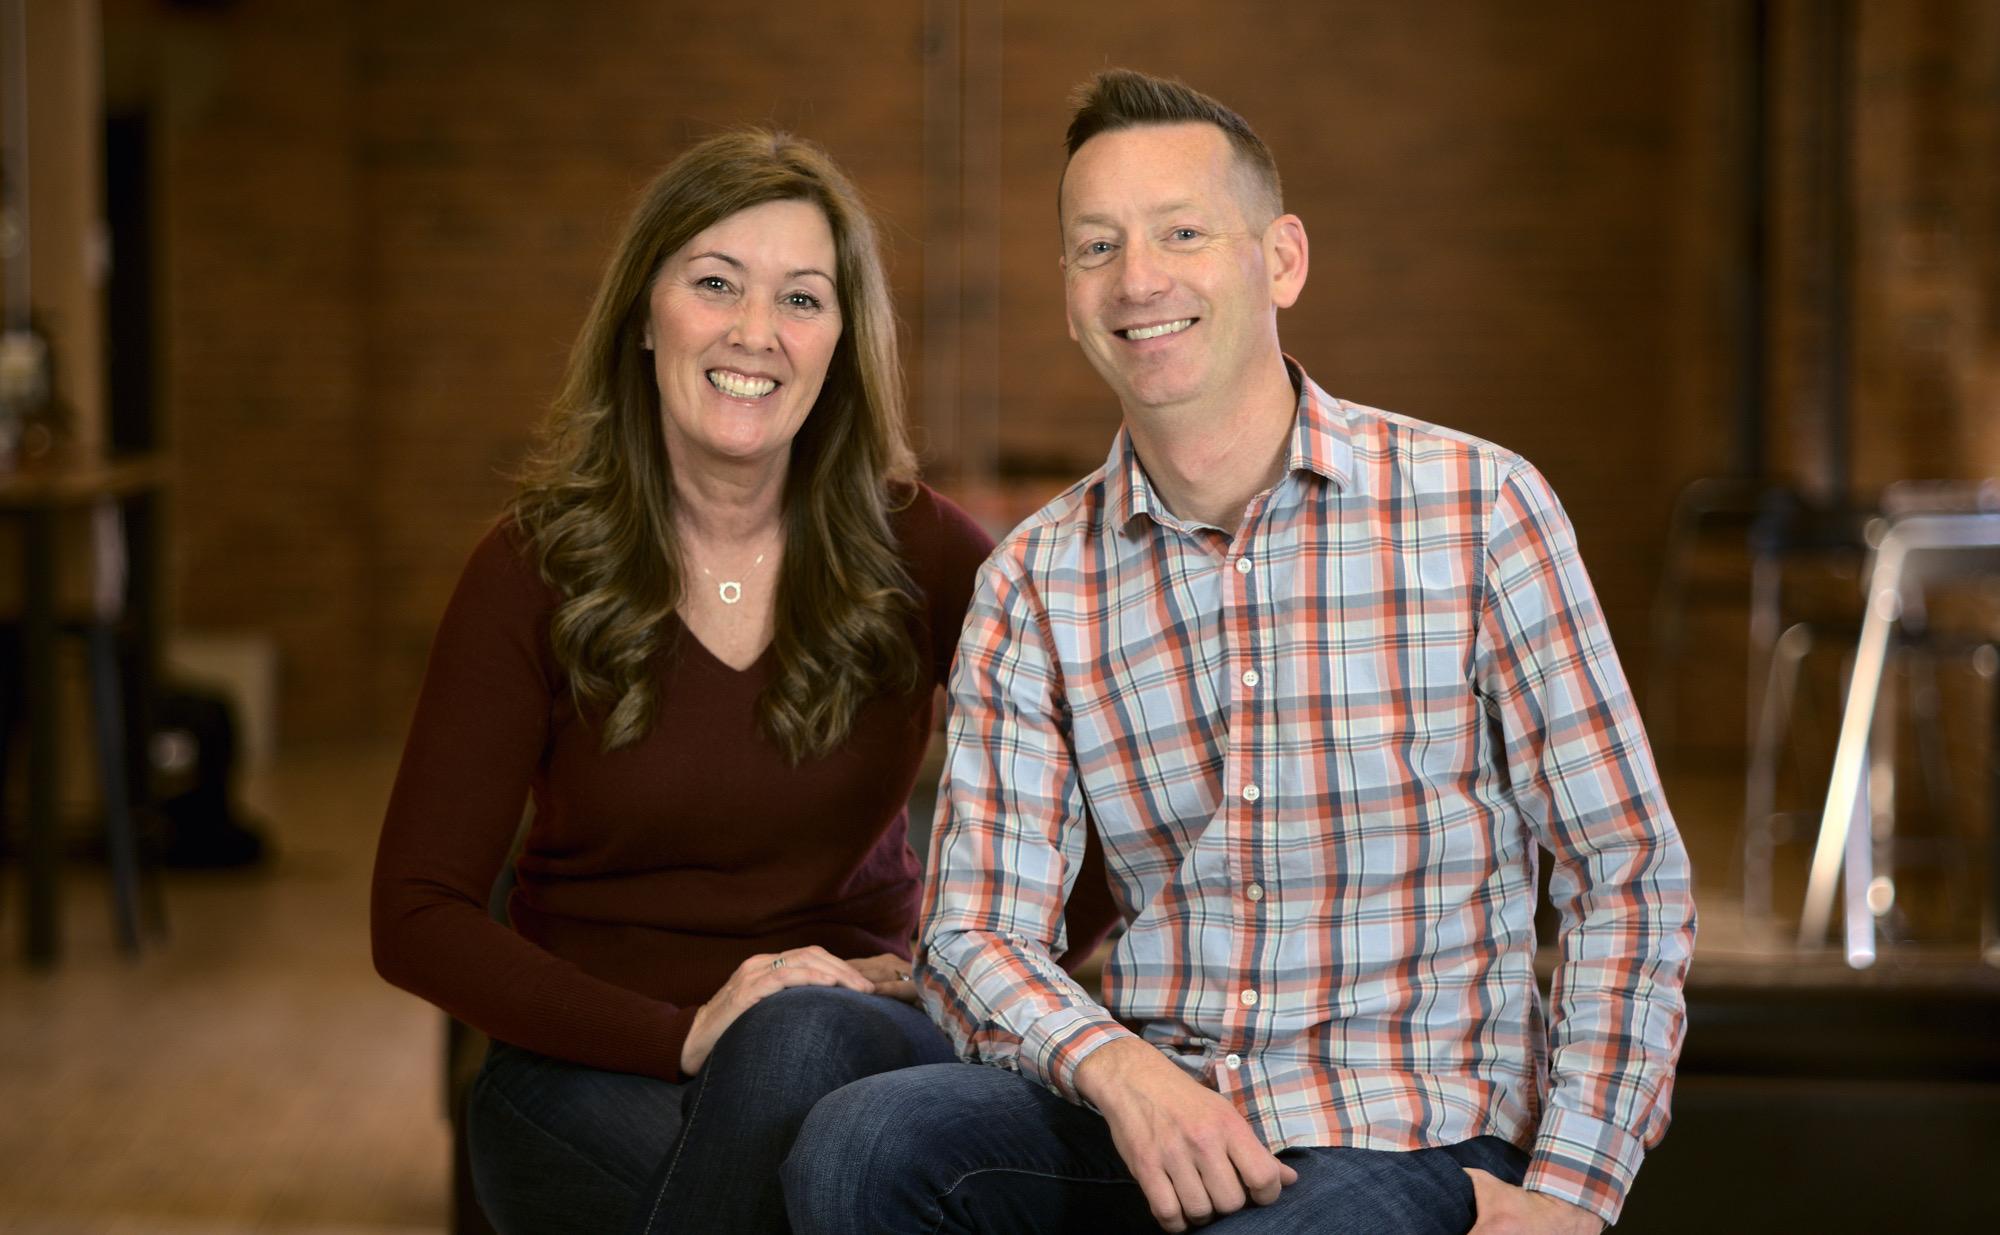 Meet Melissa and JJ